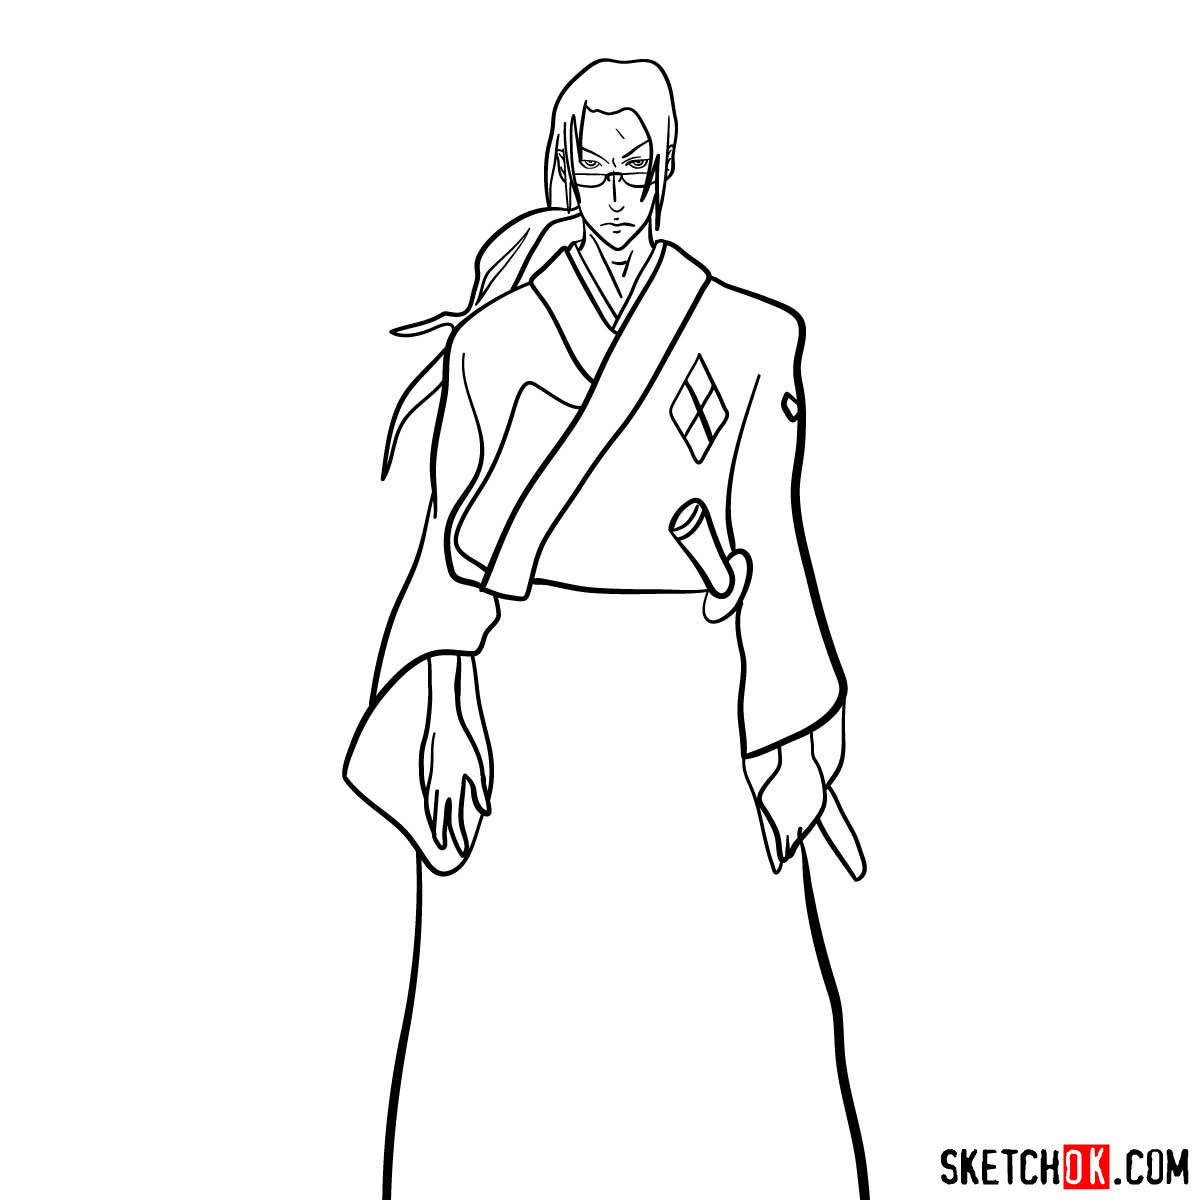 Making the drawing of Jin in full growth | Samurai Champloo